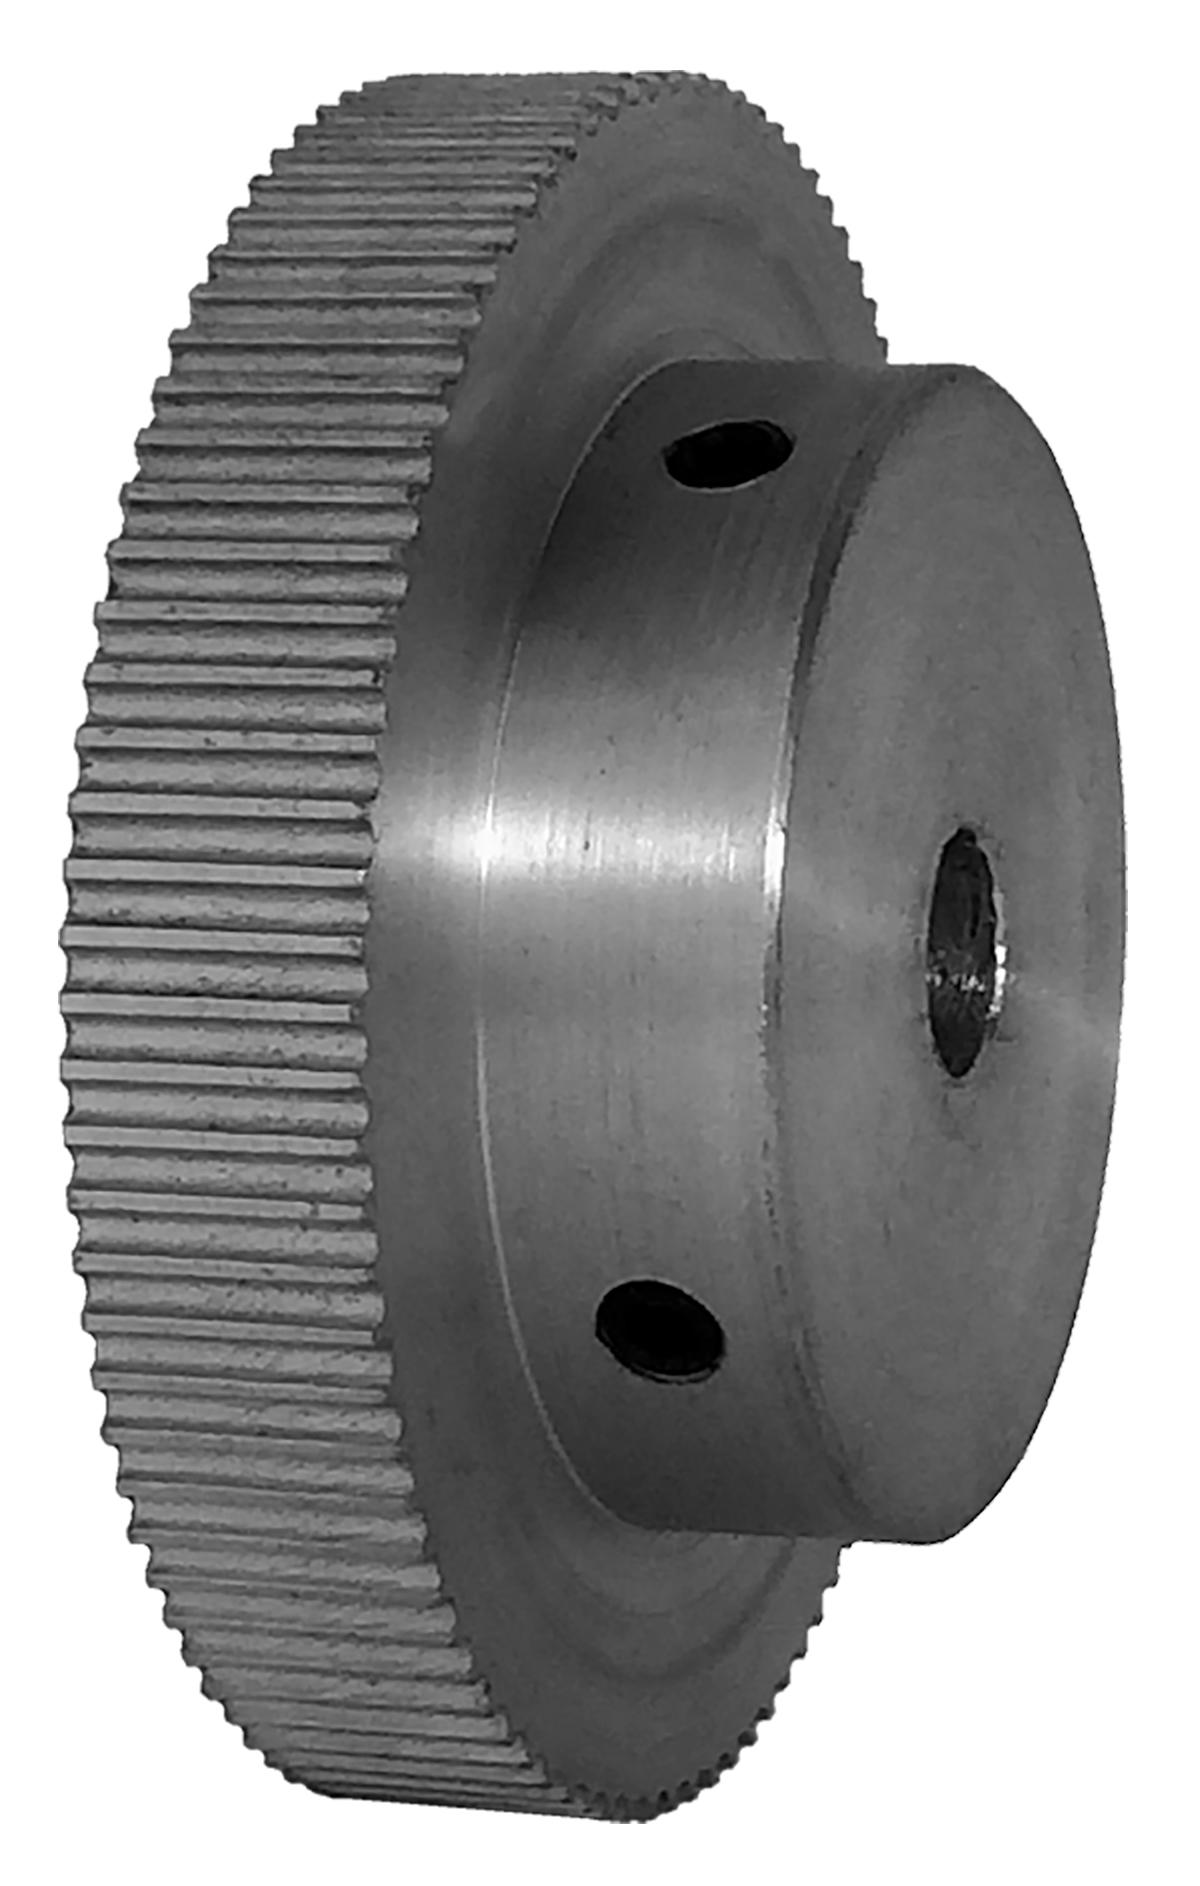 90-2P06-6A4 - Aluminum Powerhouse® Pulleys